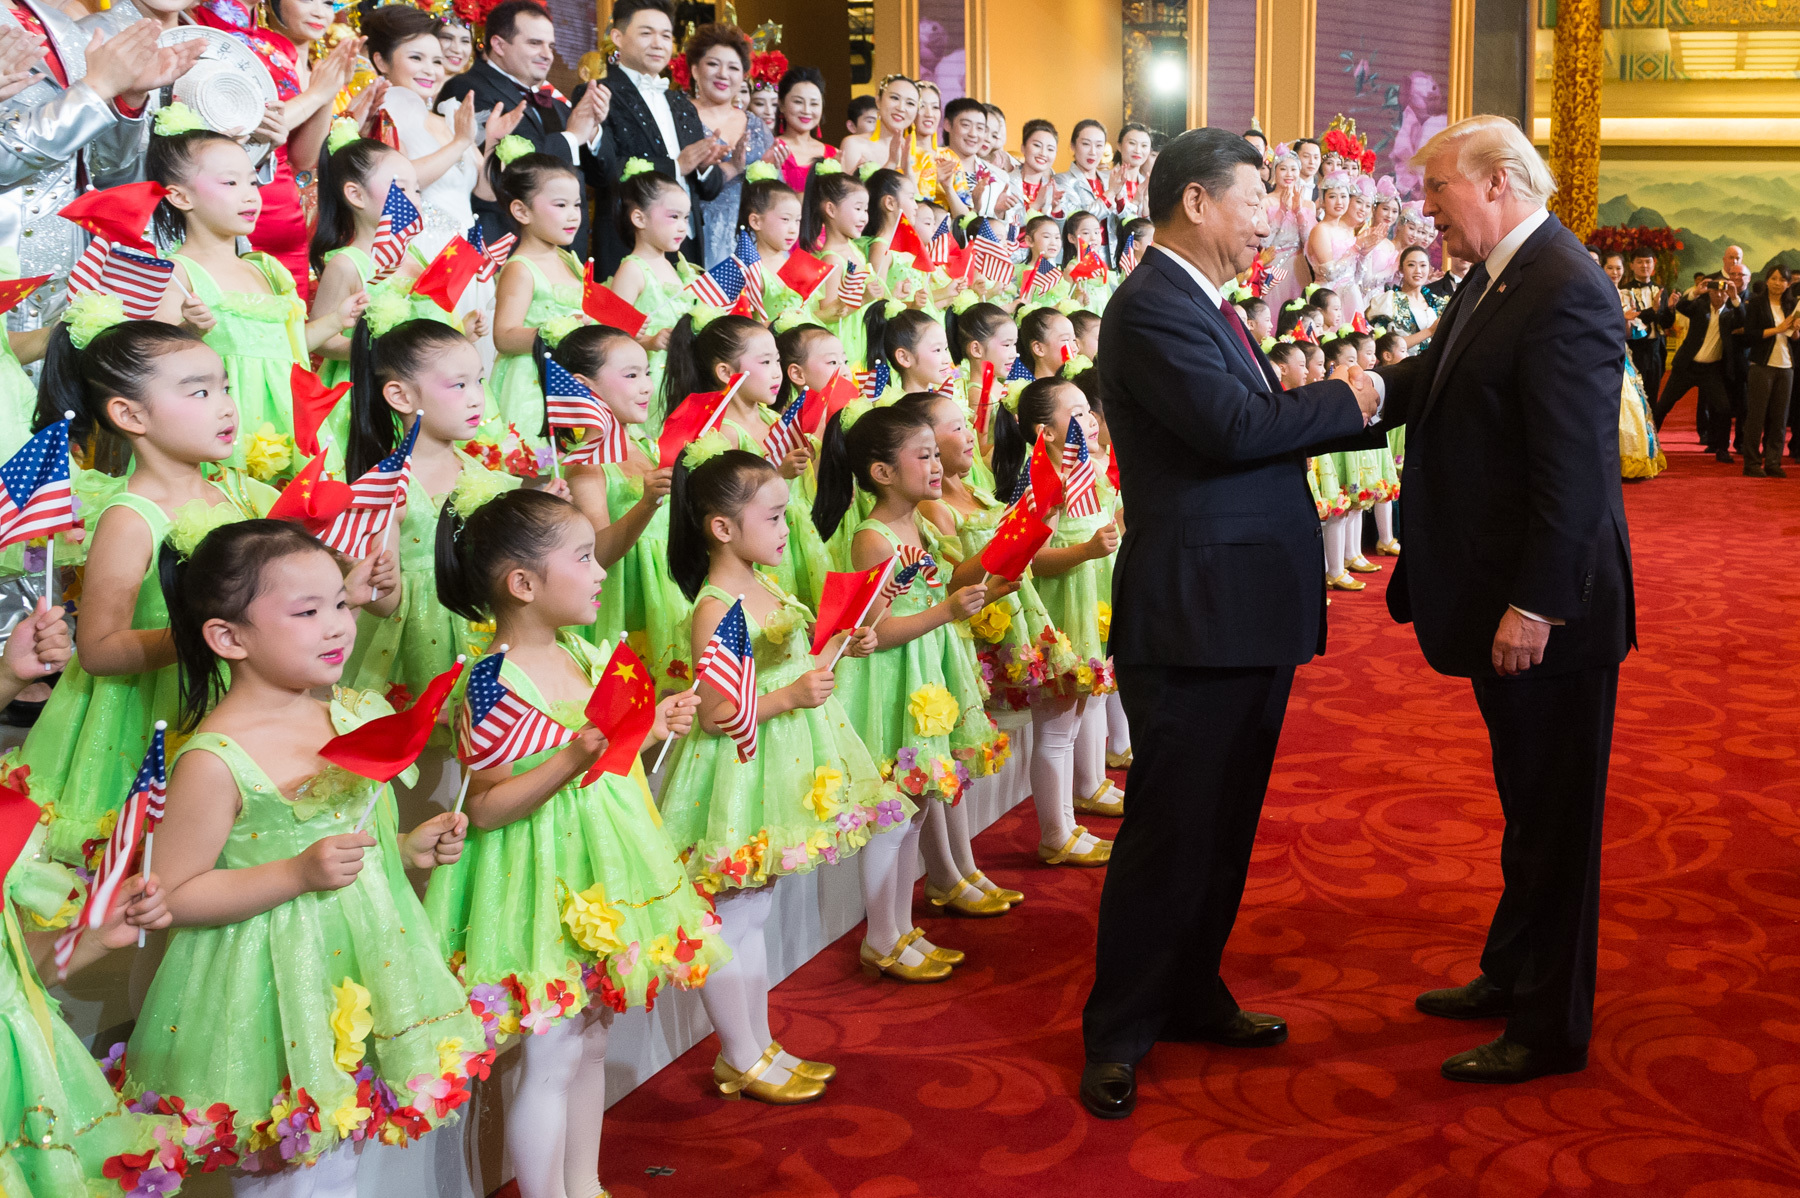 Foto: Andrea Hanks/Official White House